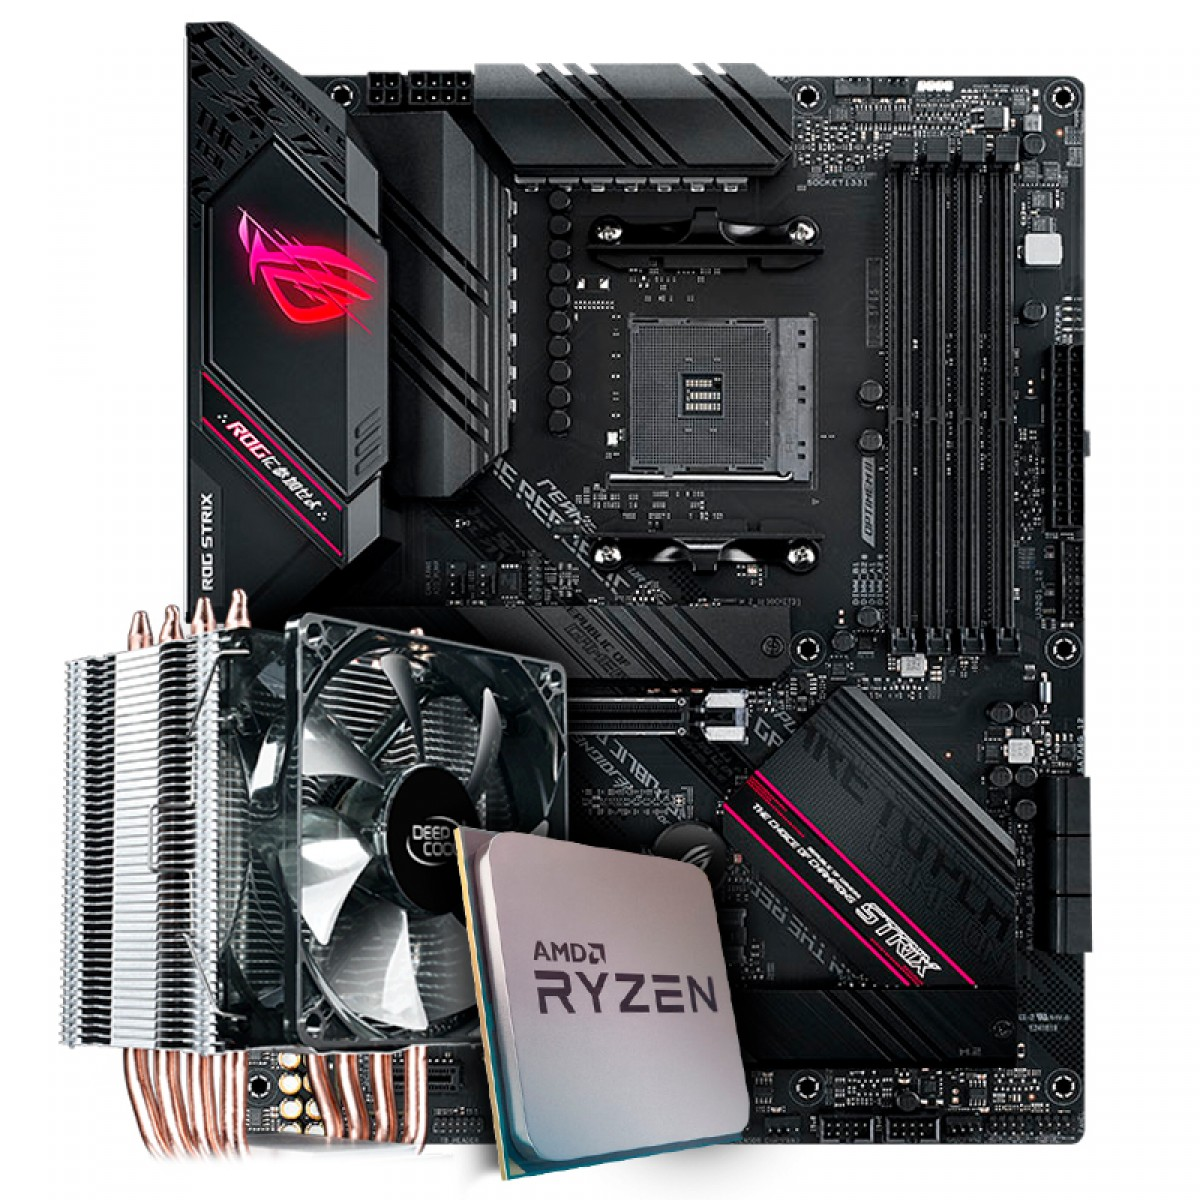 Kit Upgrade, AMD Ryzen 9 3900X, Asus ROG Strix B550-F Gaming, Cooler Deepcool Gammaxx